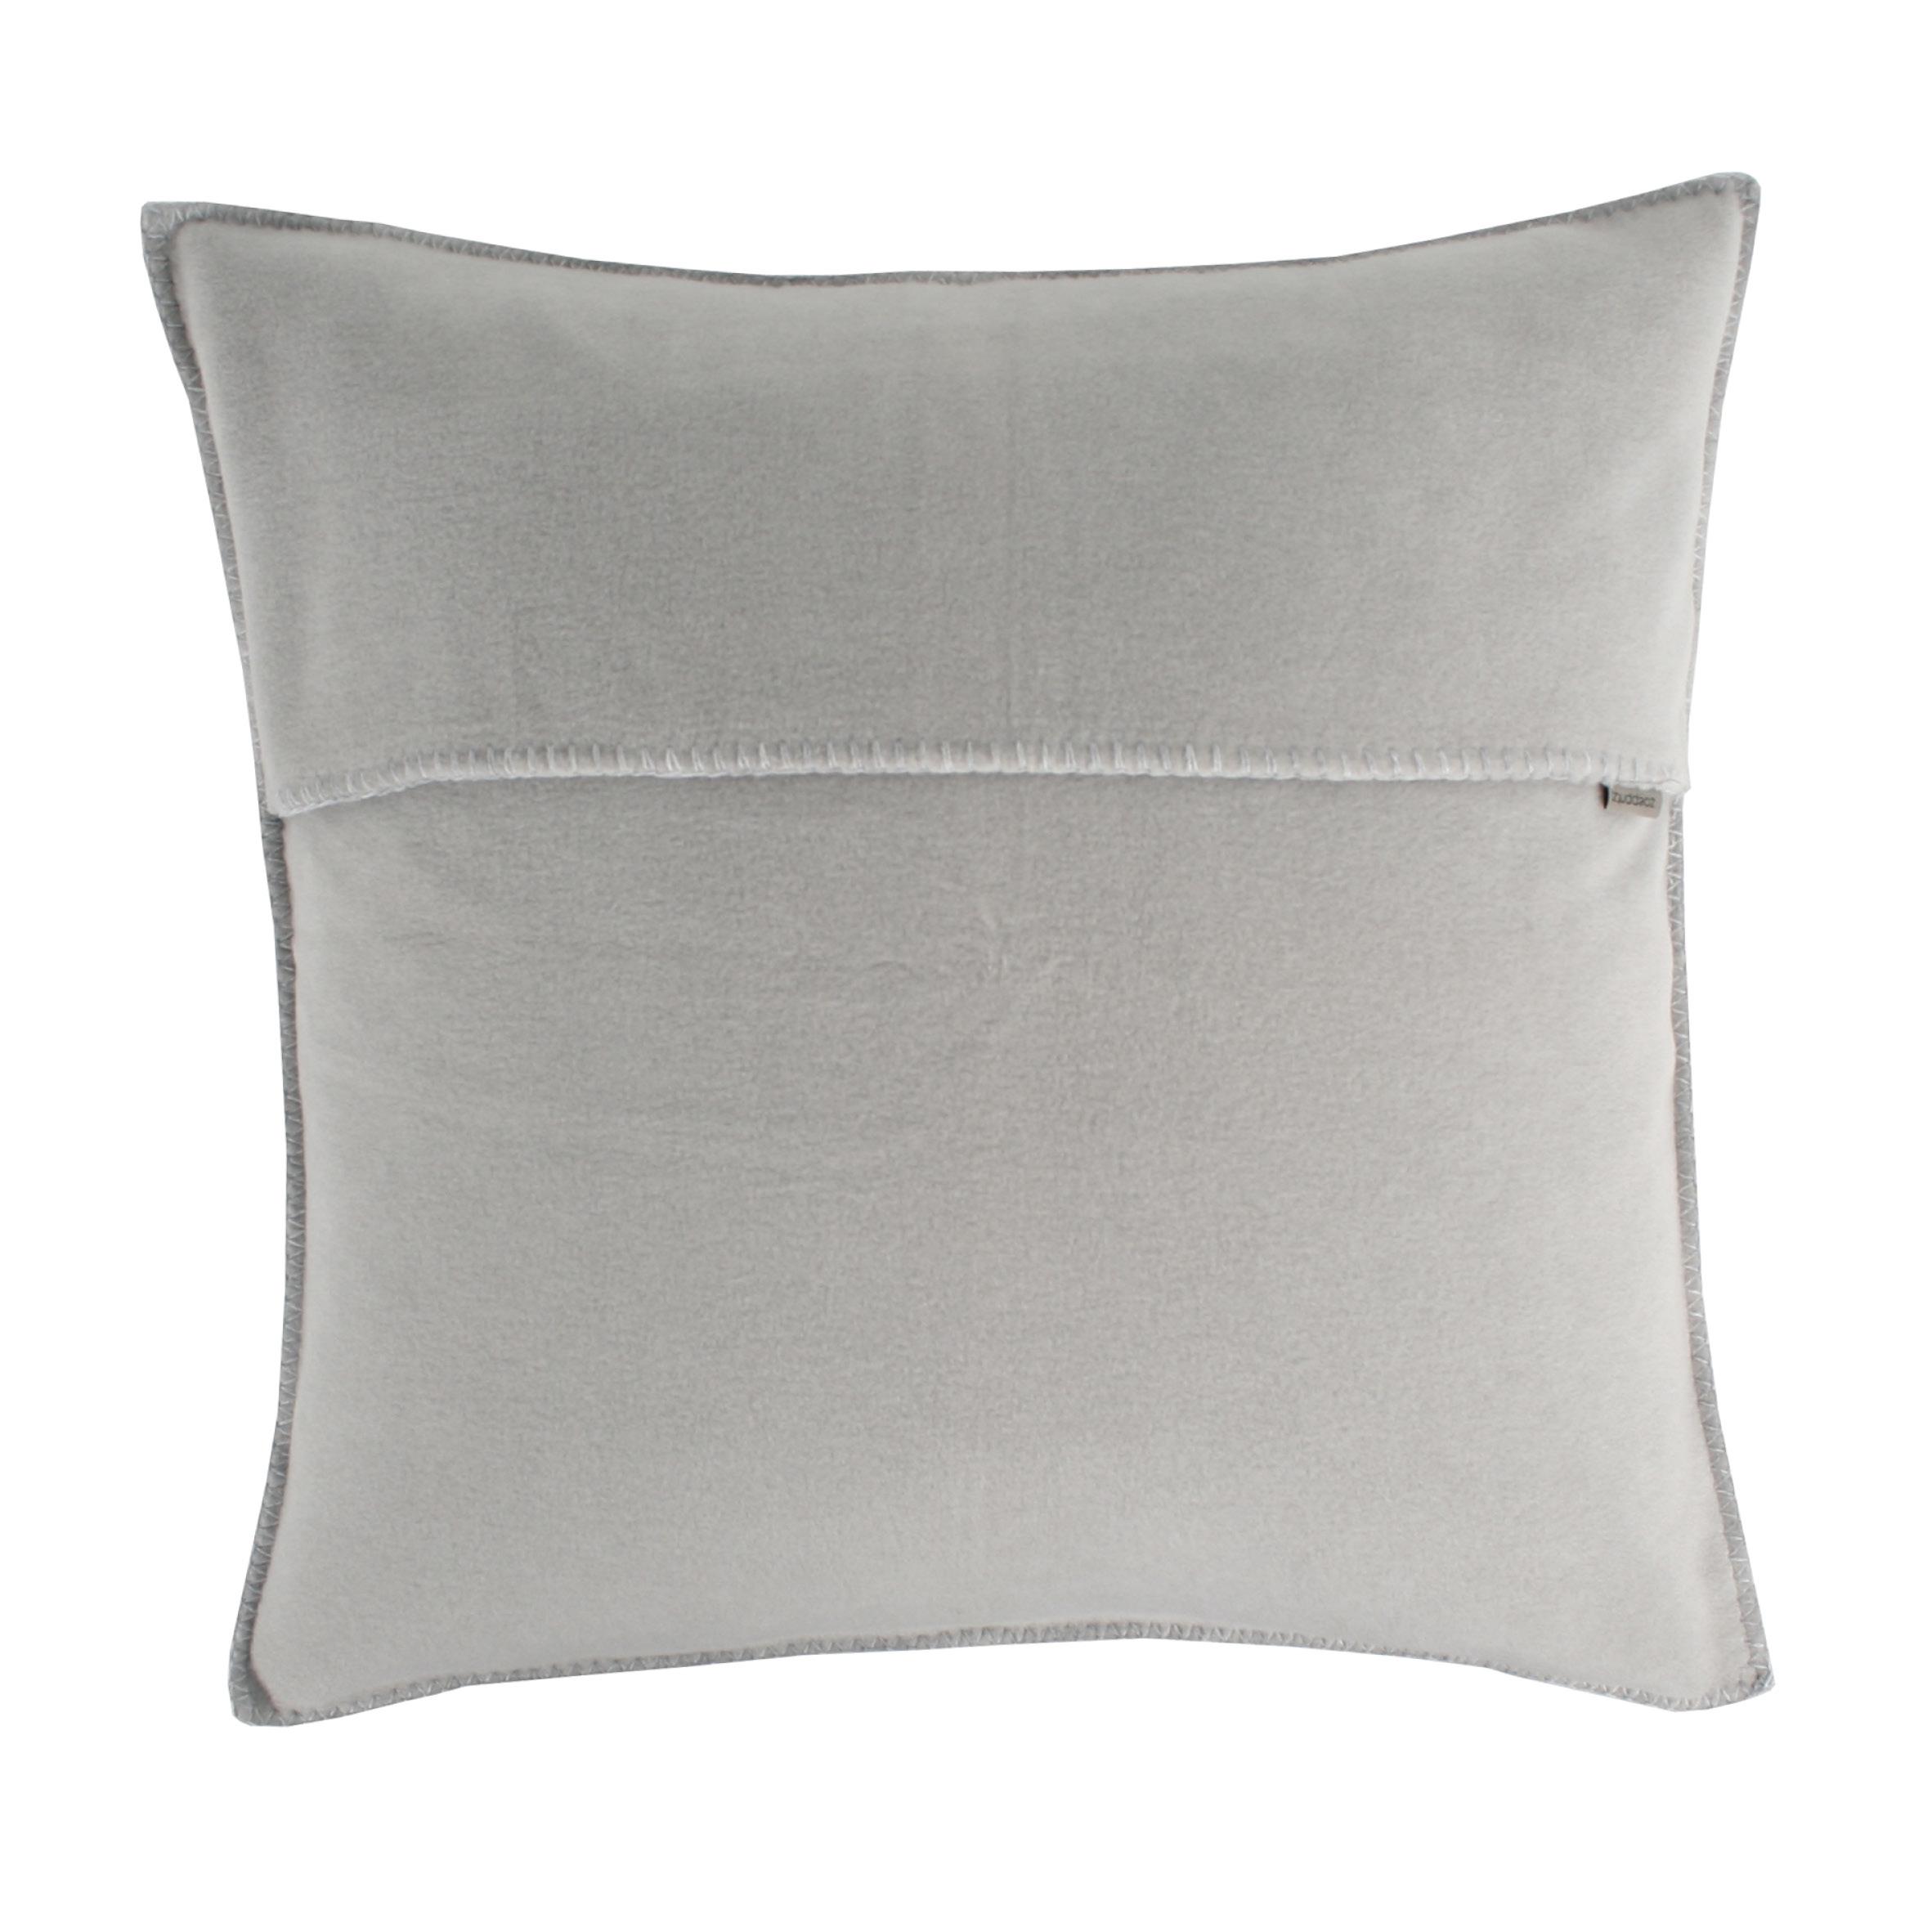 zoeppritz soft fleece kissen 50x50 mausgrau 2 er set. Black Bedroom Furniture Sets. Home Design Ideas